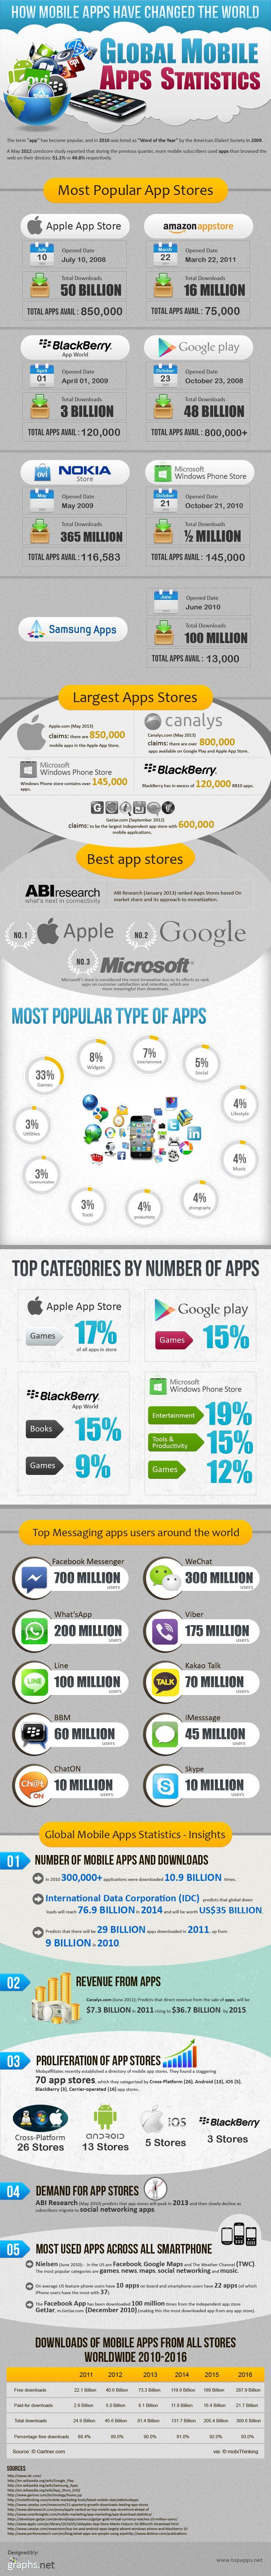 Global Mobile Apps Statistics  Infographic Via Edudemic